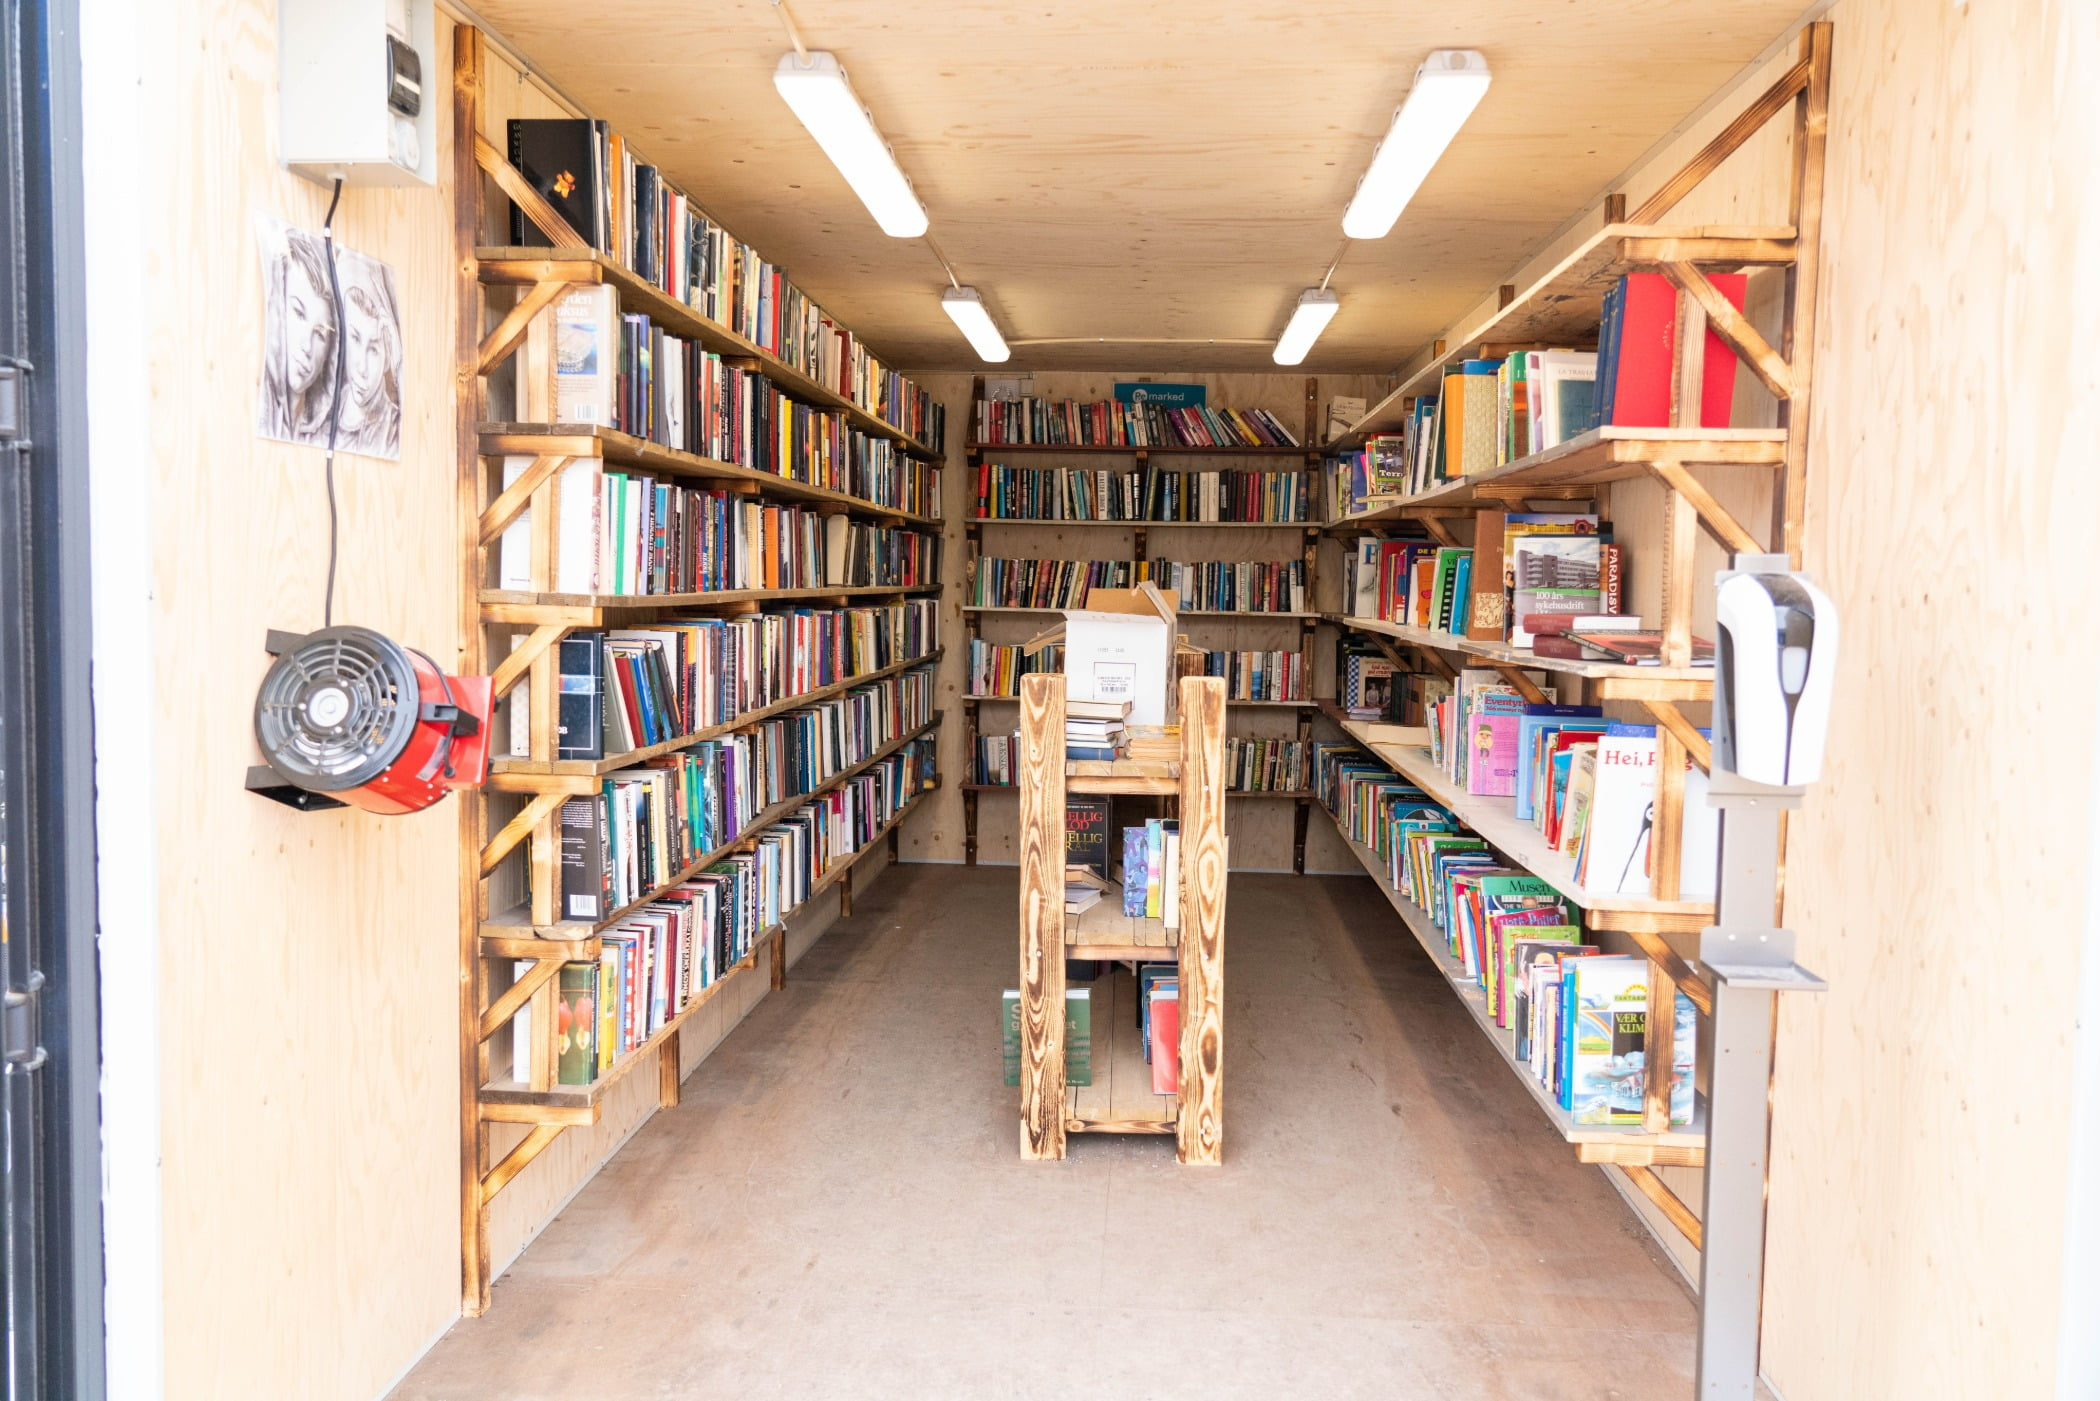 Interior design, Bookcase, Shelf, Property, Furniture, Shelving, Publication, Book, Wood, Architecture